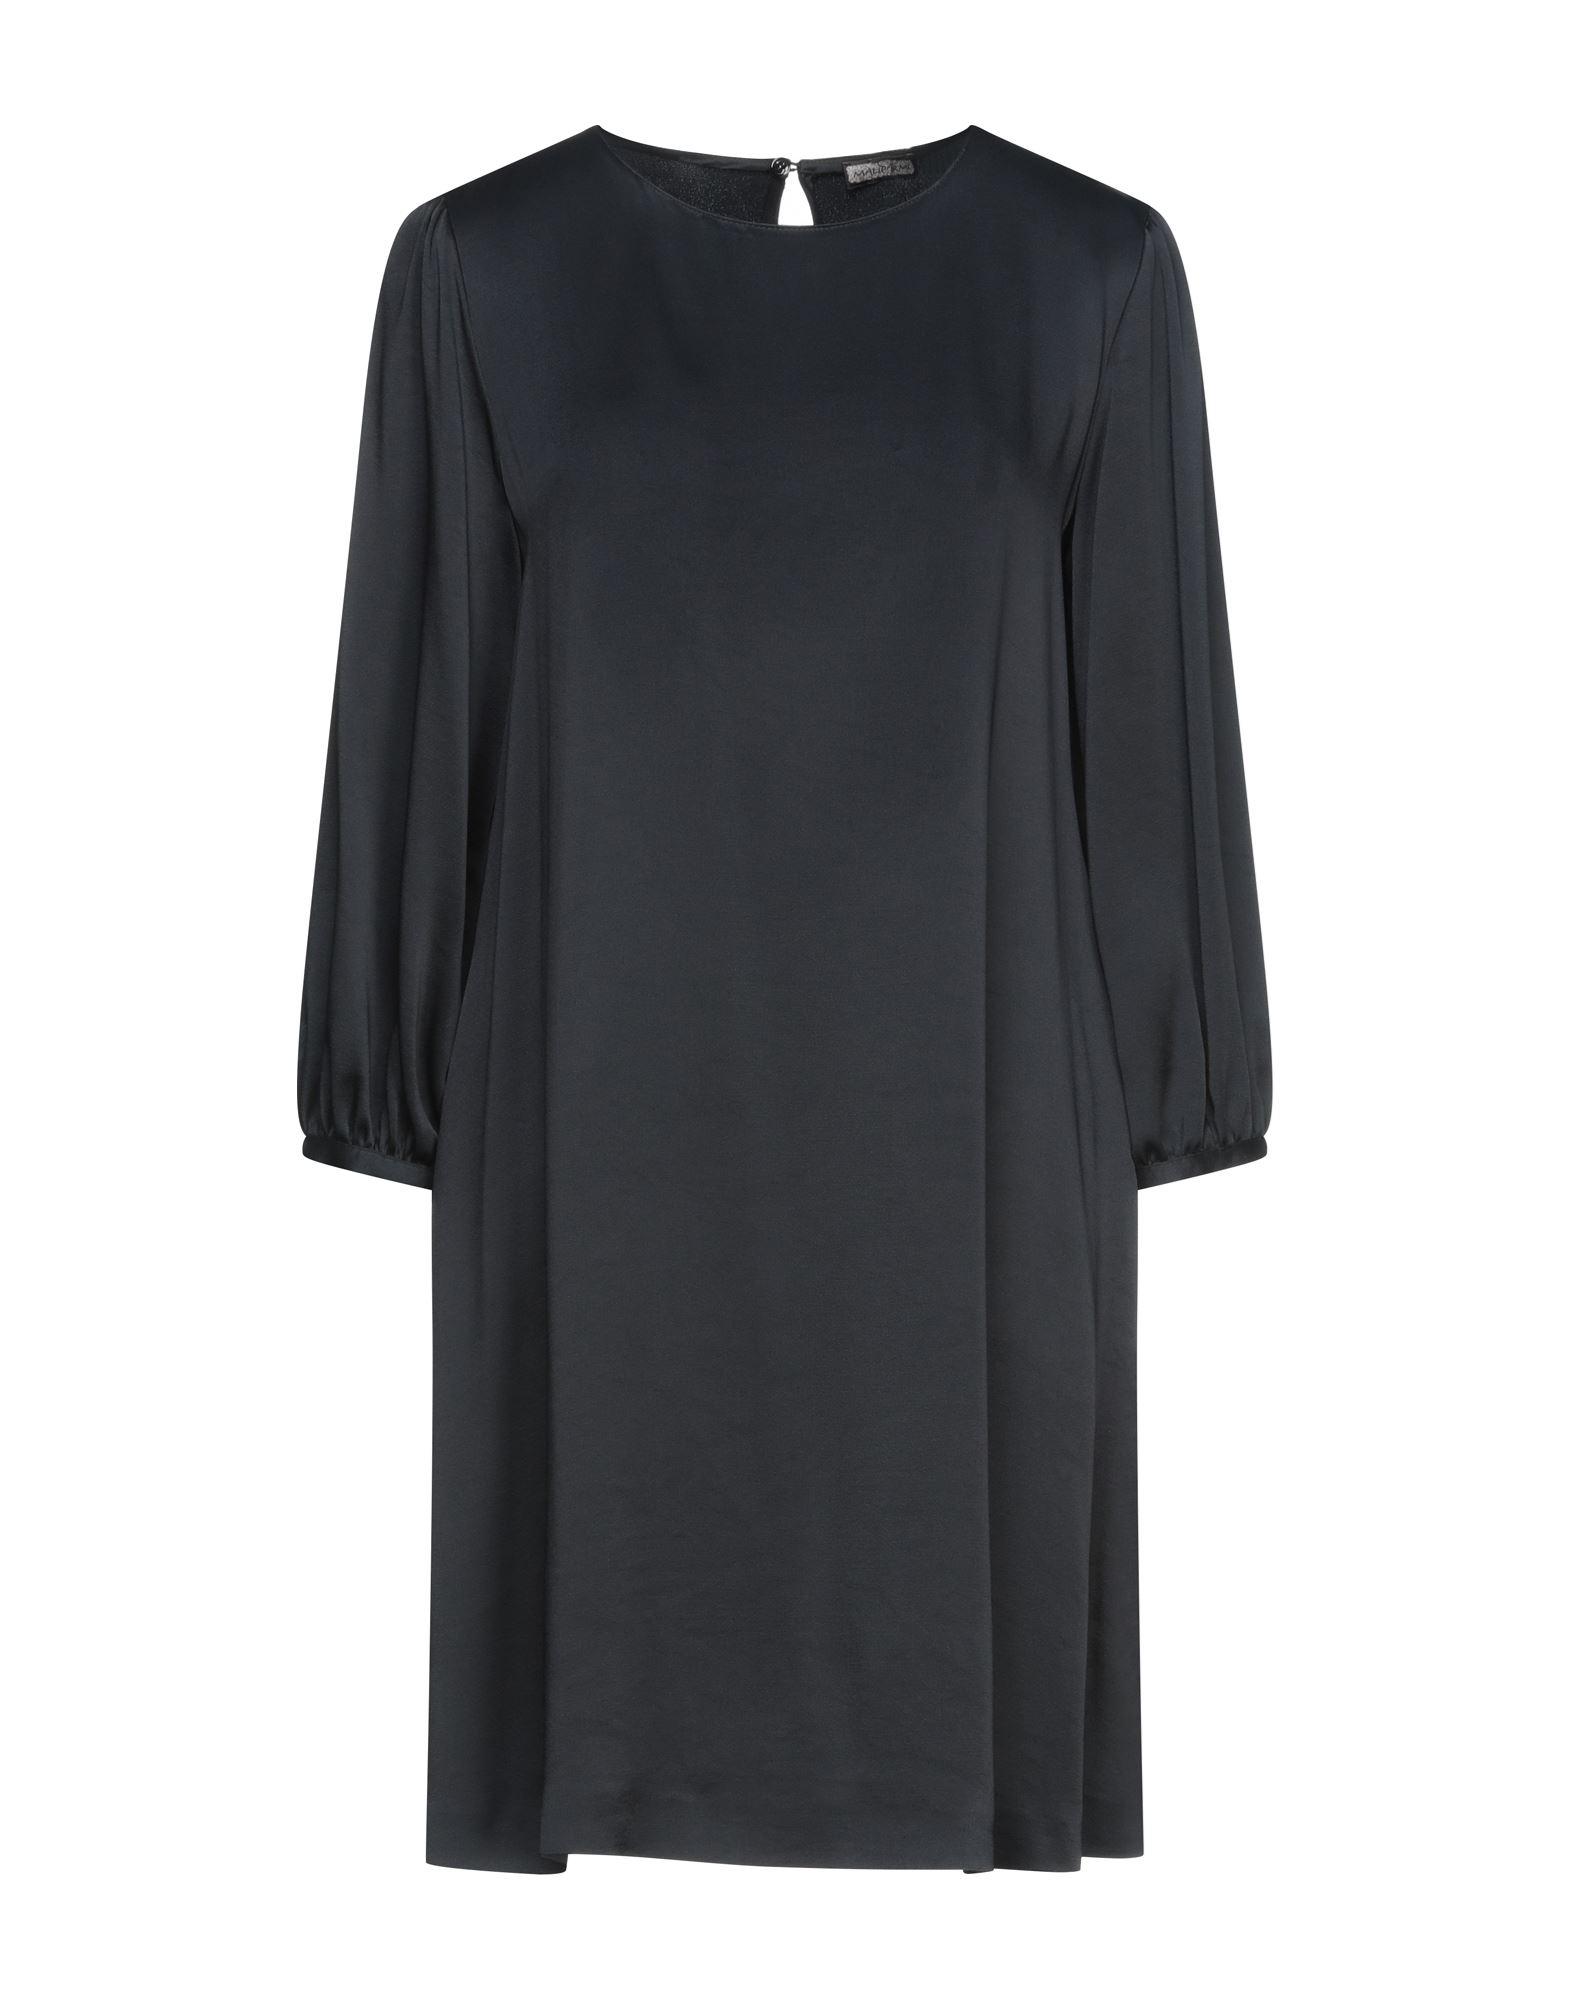 Фото - MALÌPARMI Короткое платье malìparmi платье длиной 3 4